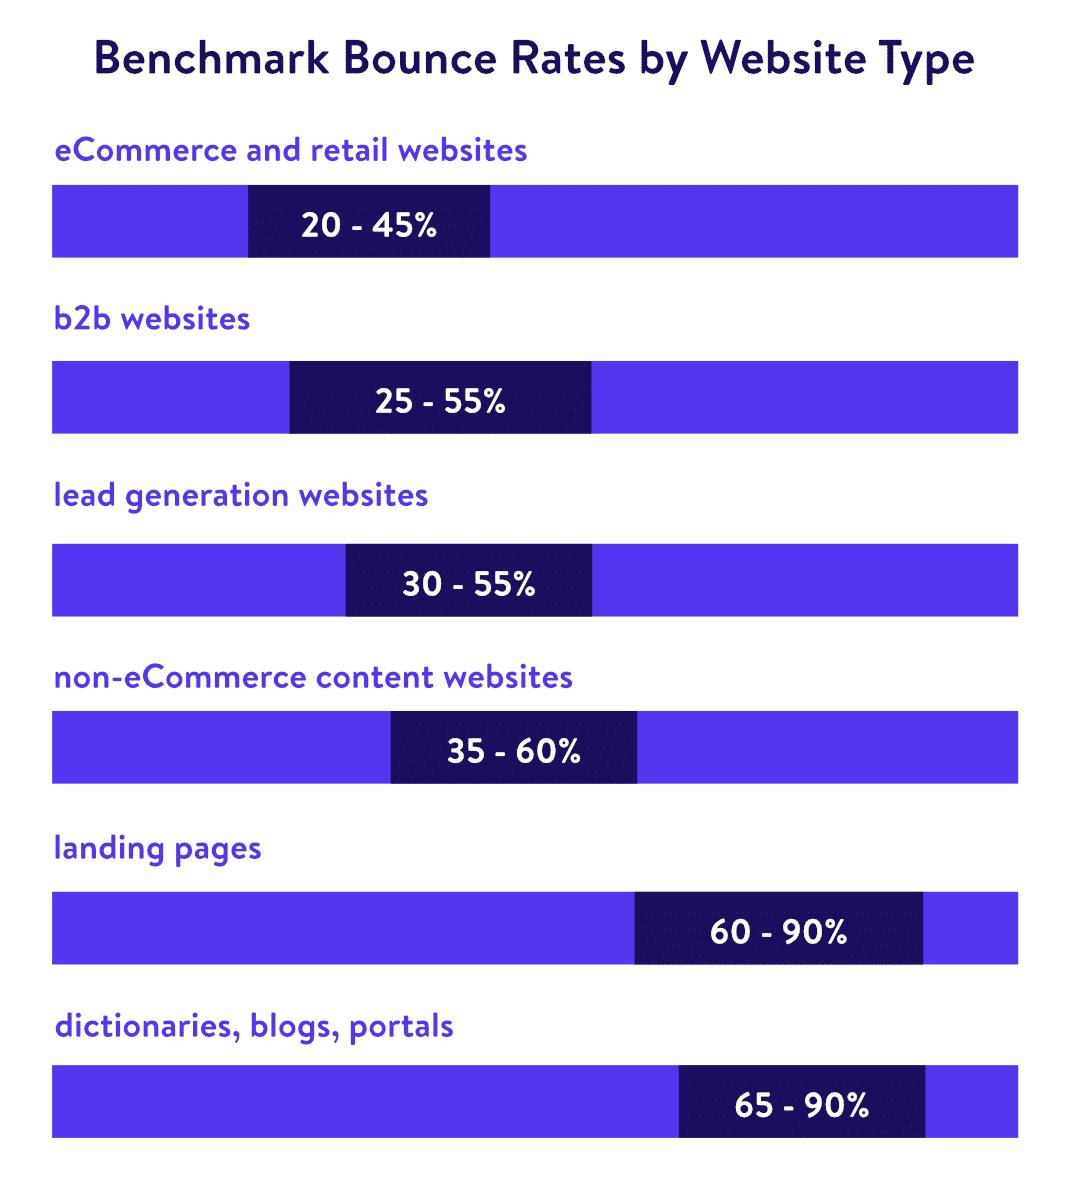 Taux de rebond moyen par type de site Web (Src : custommedialabs)